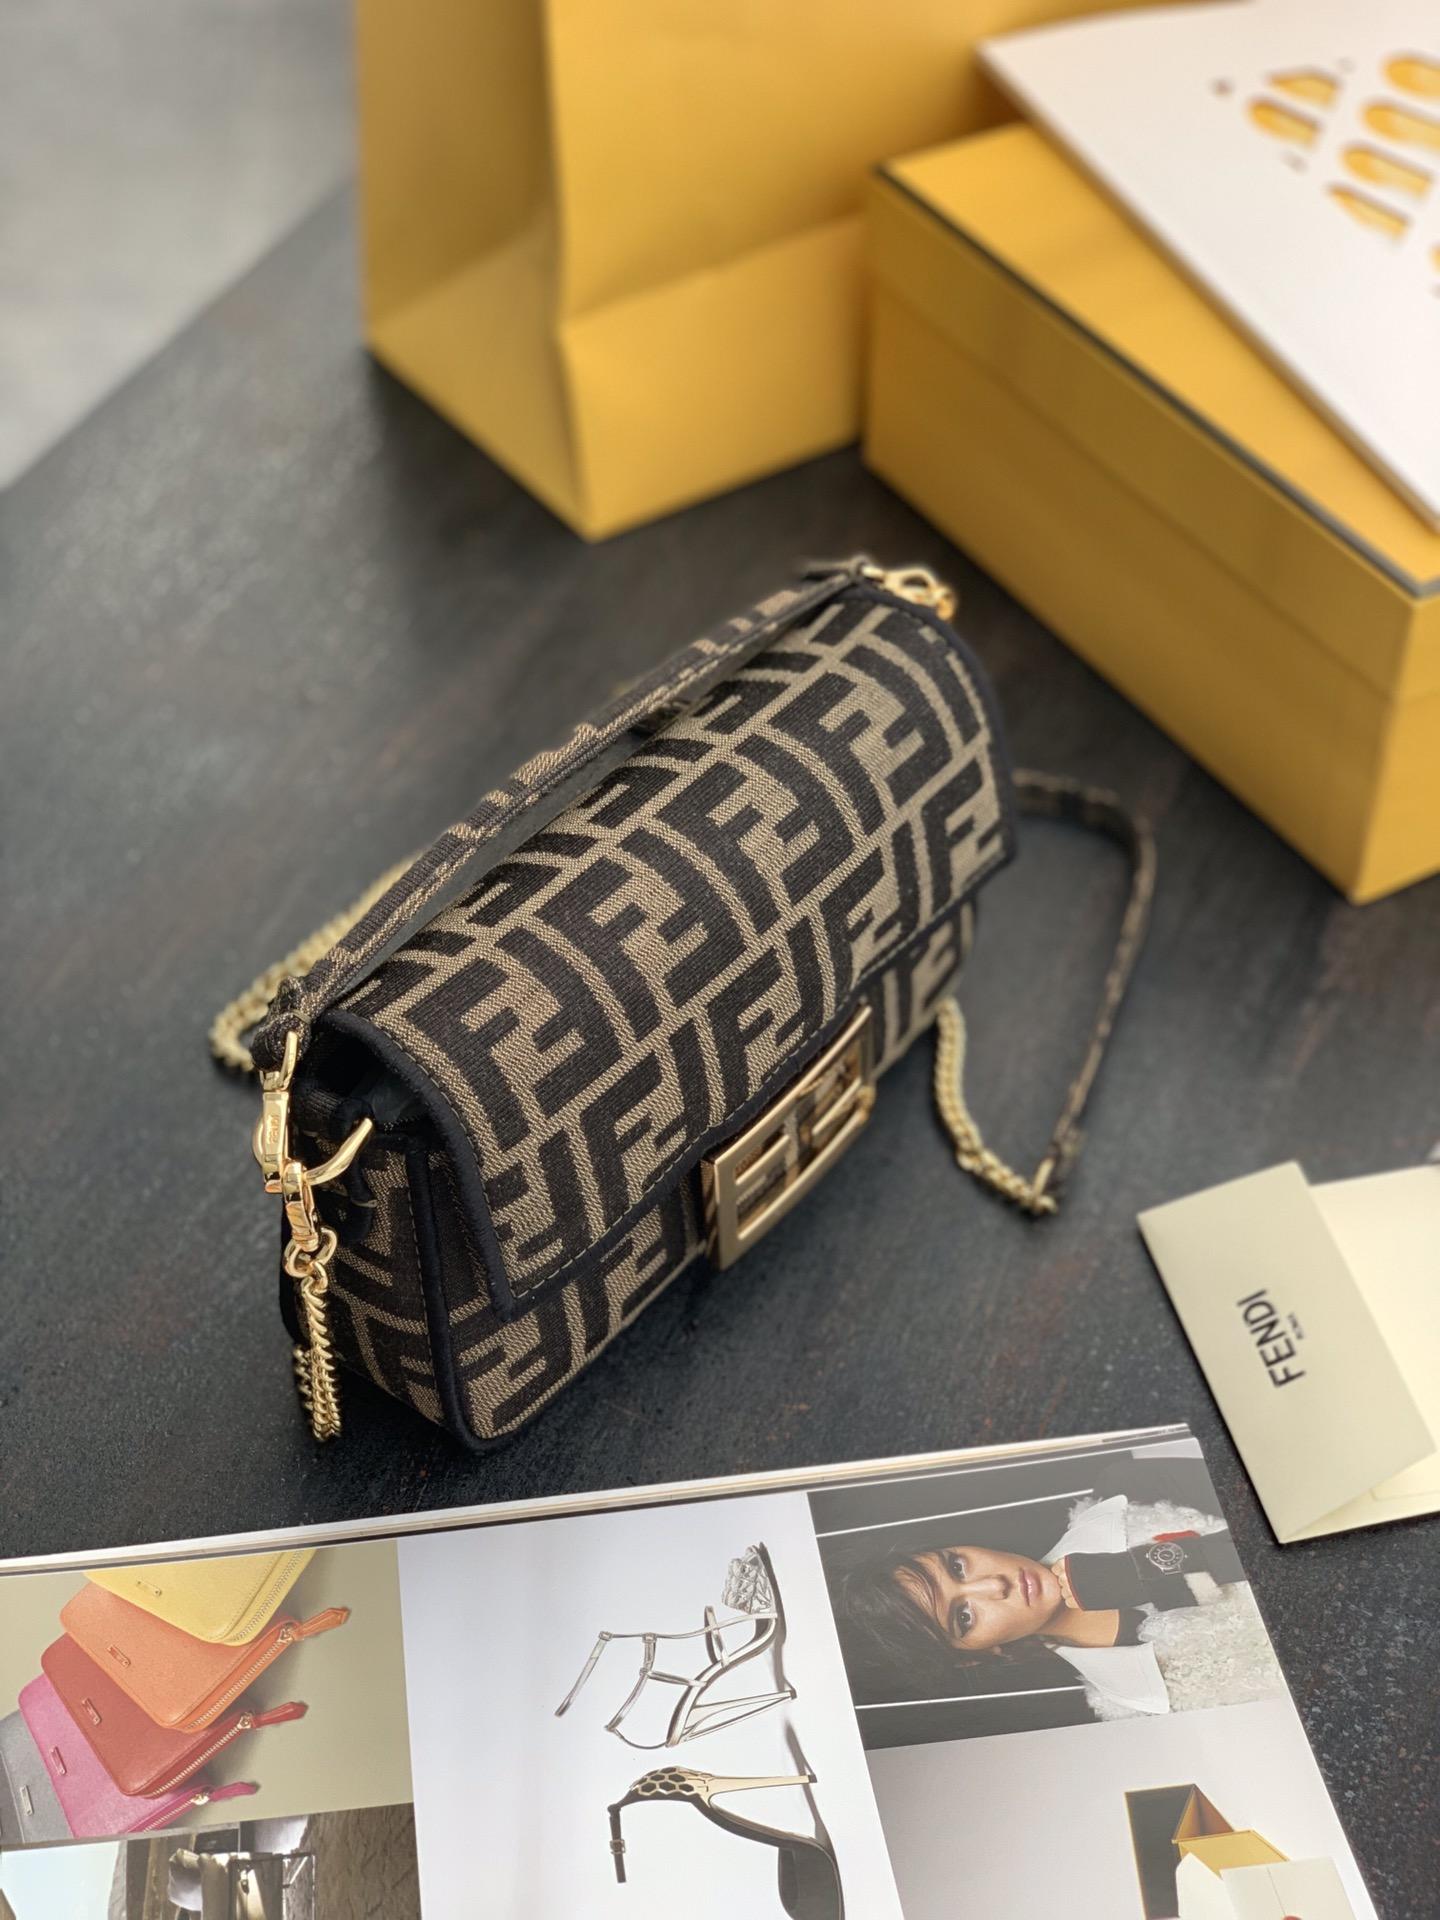 Baguette经典包款布料材质 现货 提花FF图案 黑色刺绣边缘 19cm